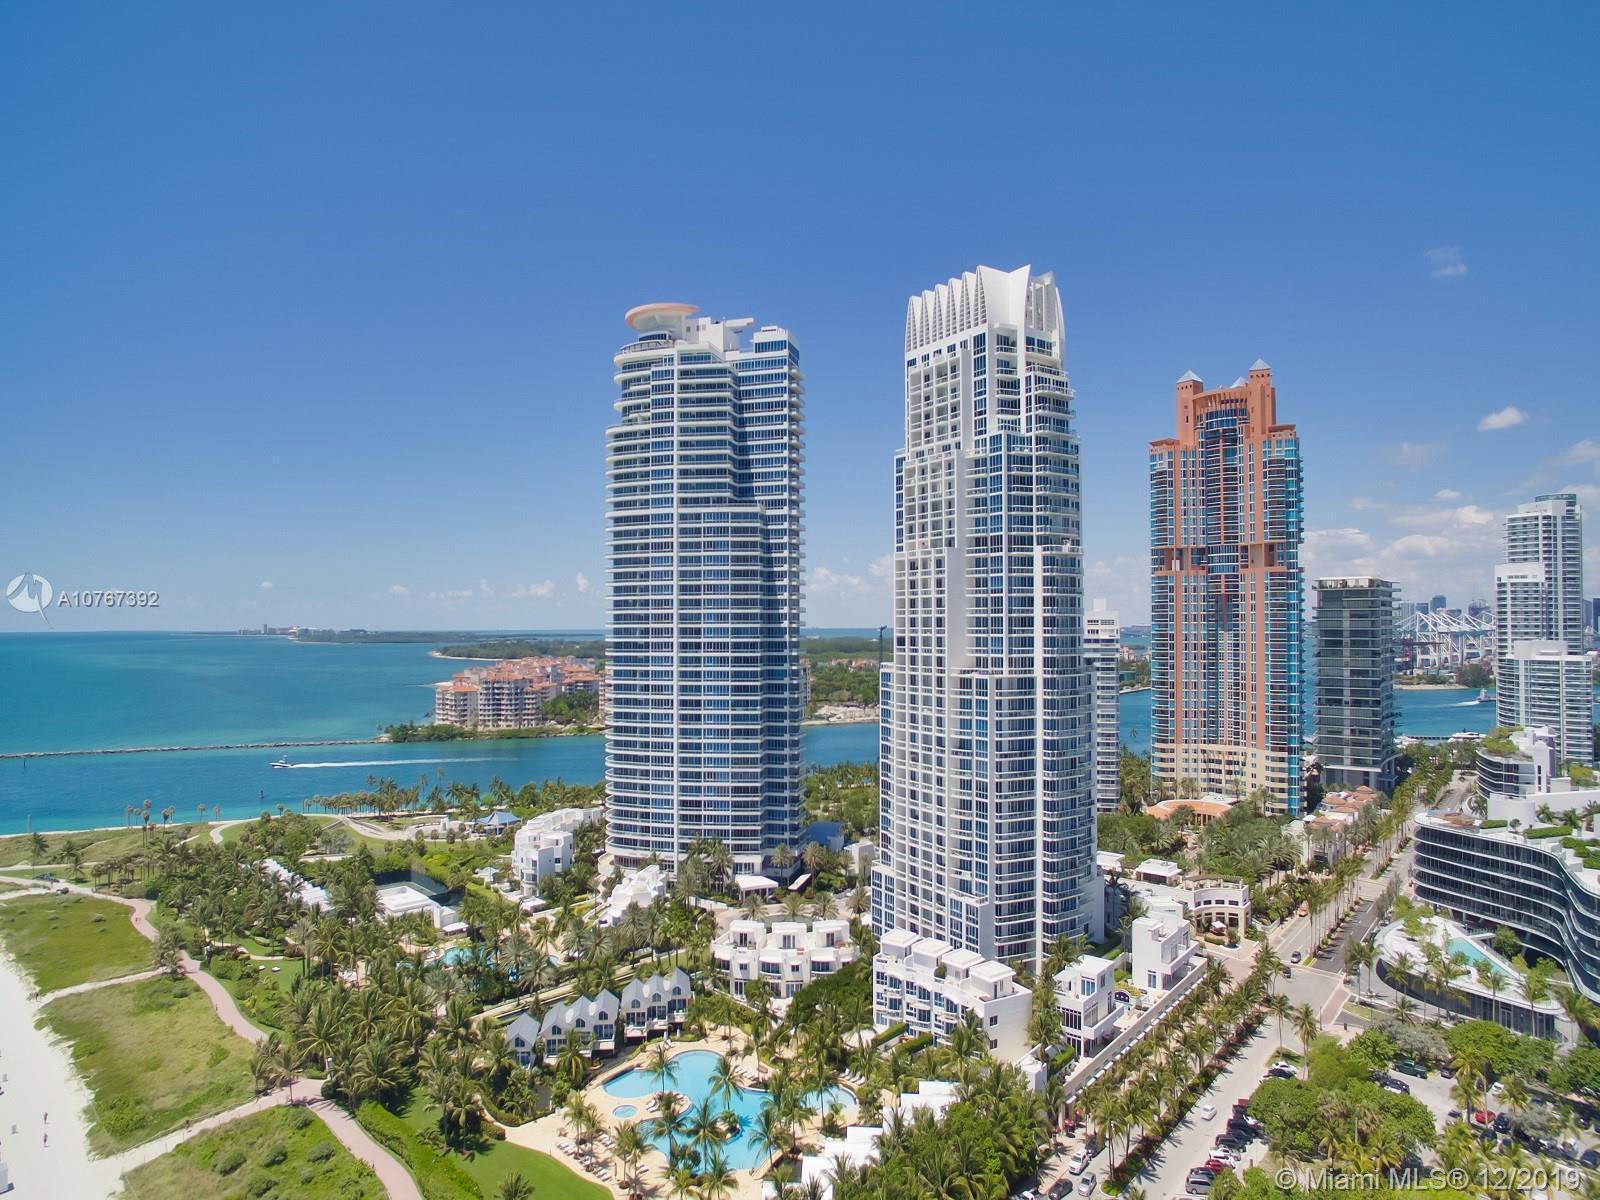 50 S Pointe Dr 616 Miami Beach Fl